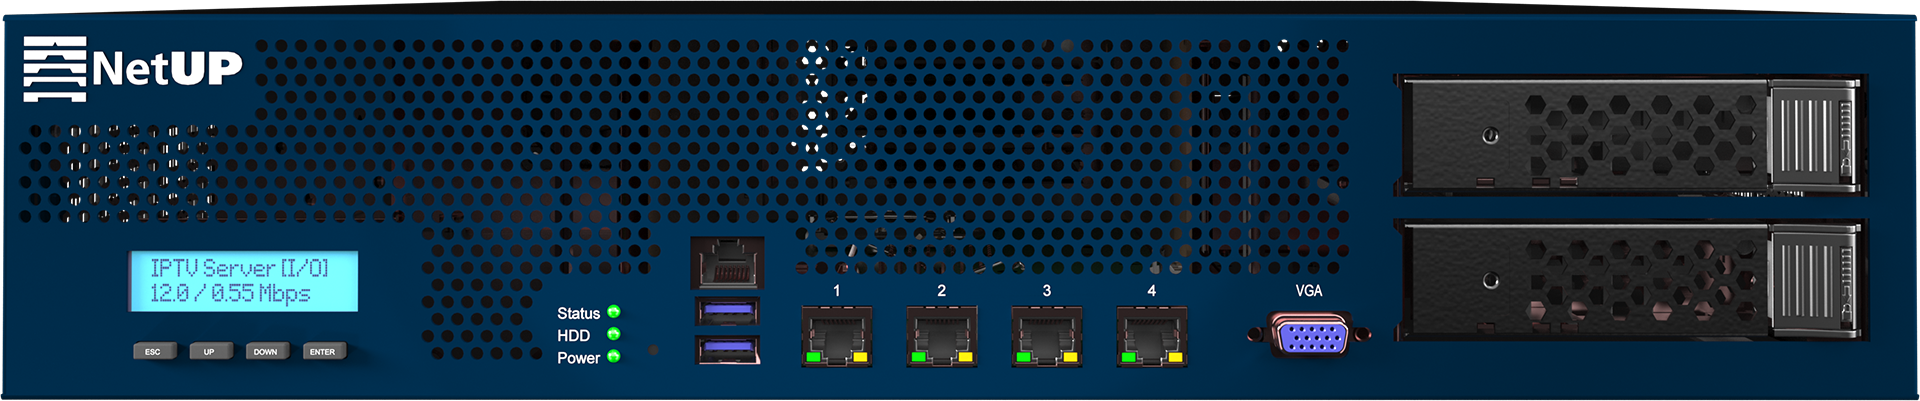 NetUP DVB IP Streamer - Universal Headend